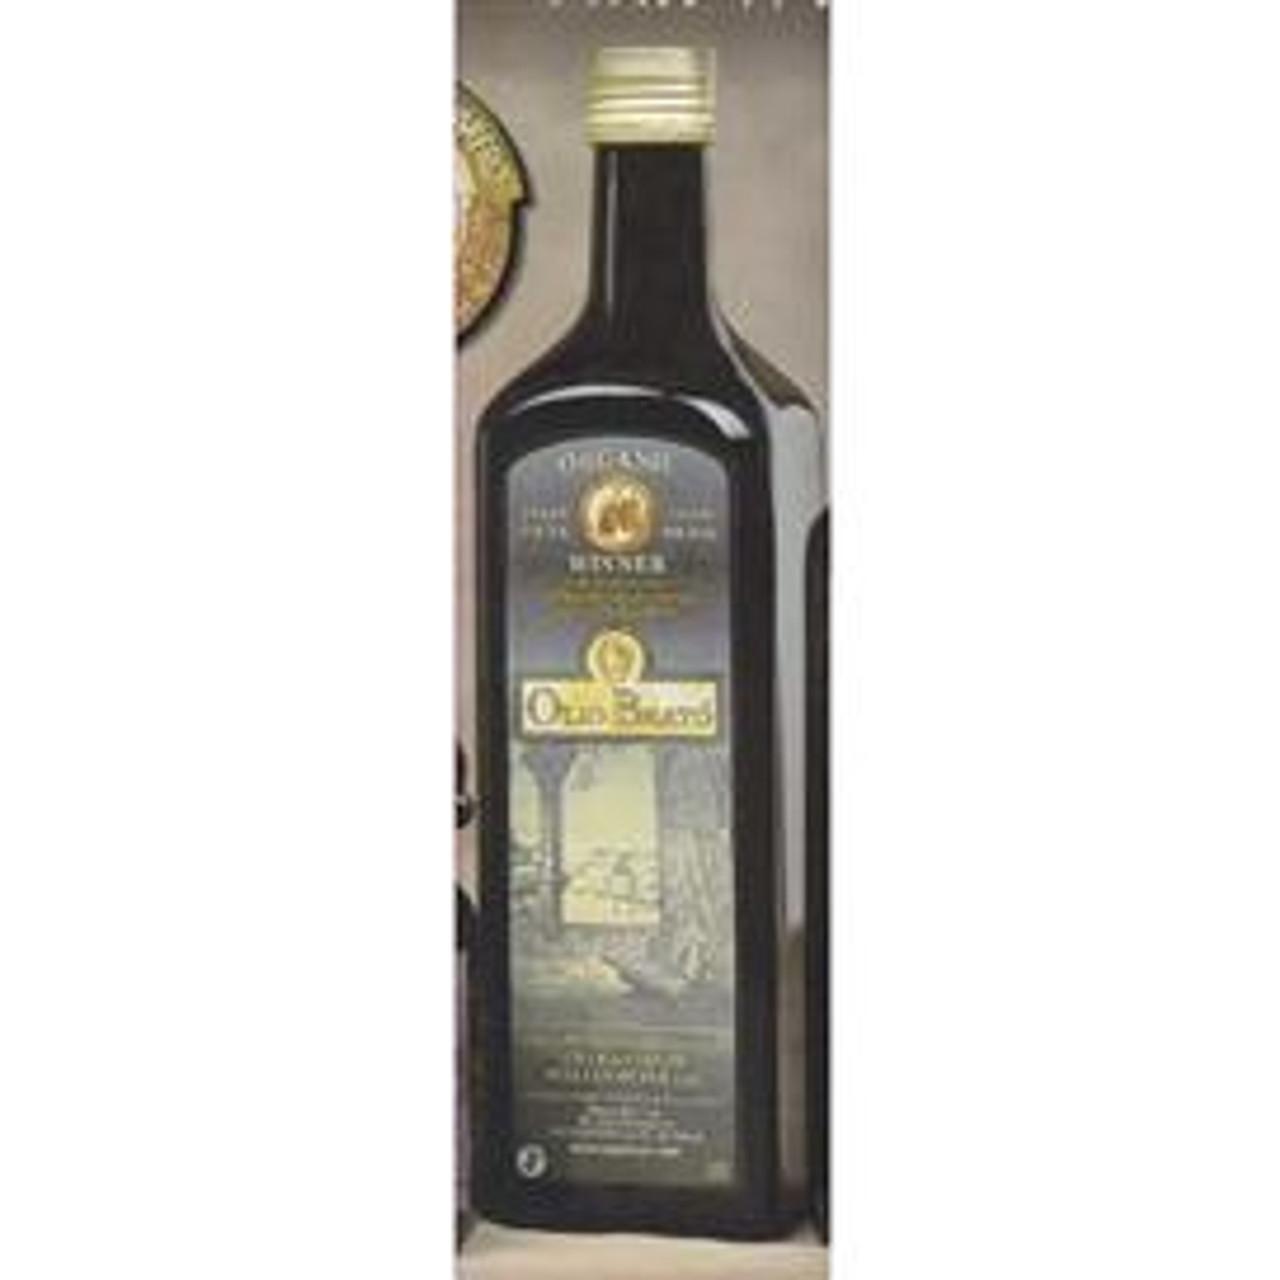 Olio Beato Extra Virgin Olive Oil